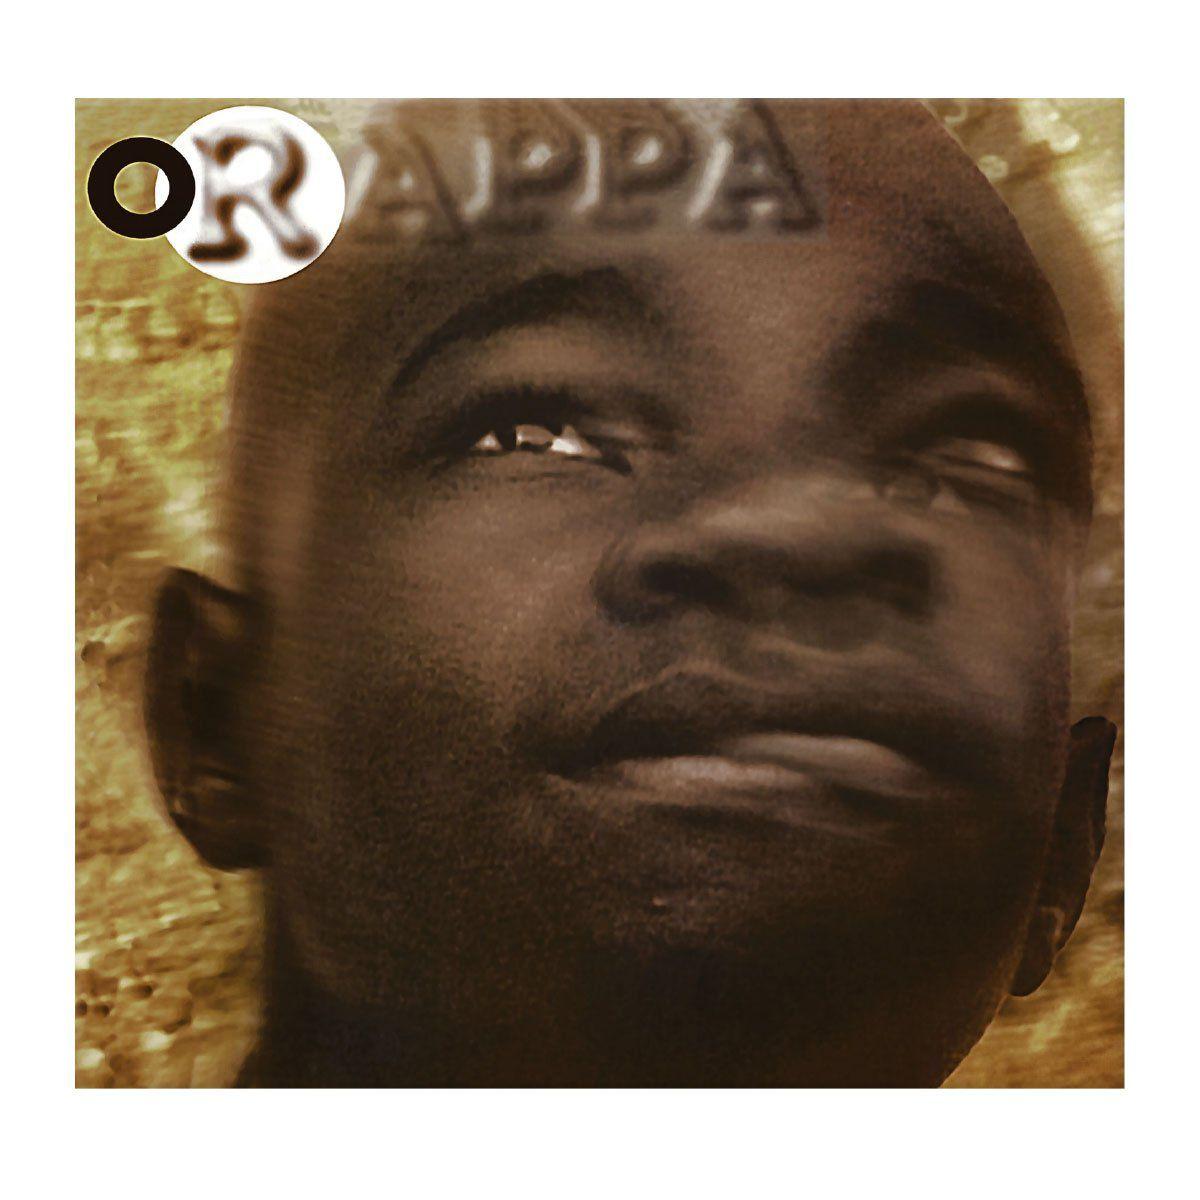 LP Duplo O Rappa  - bandUP Store Marketplace